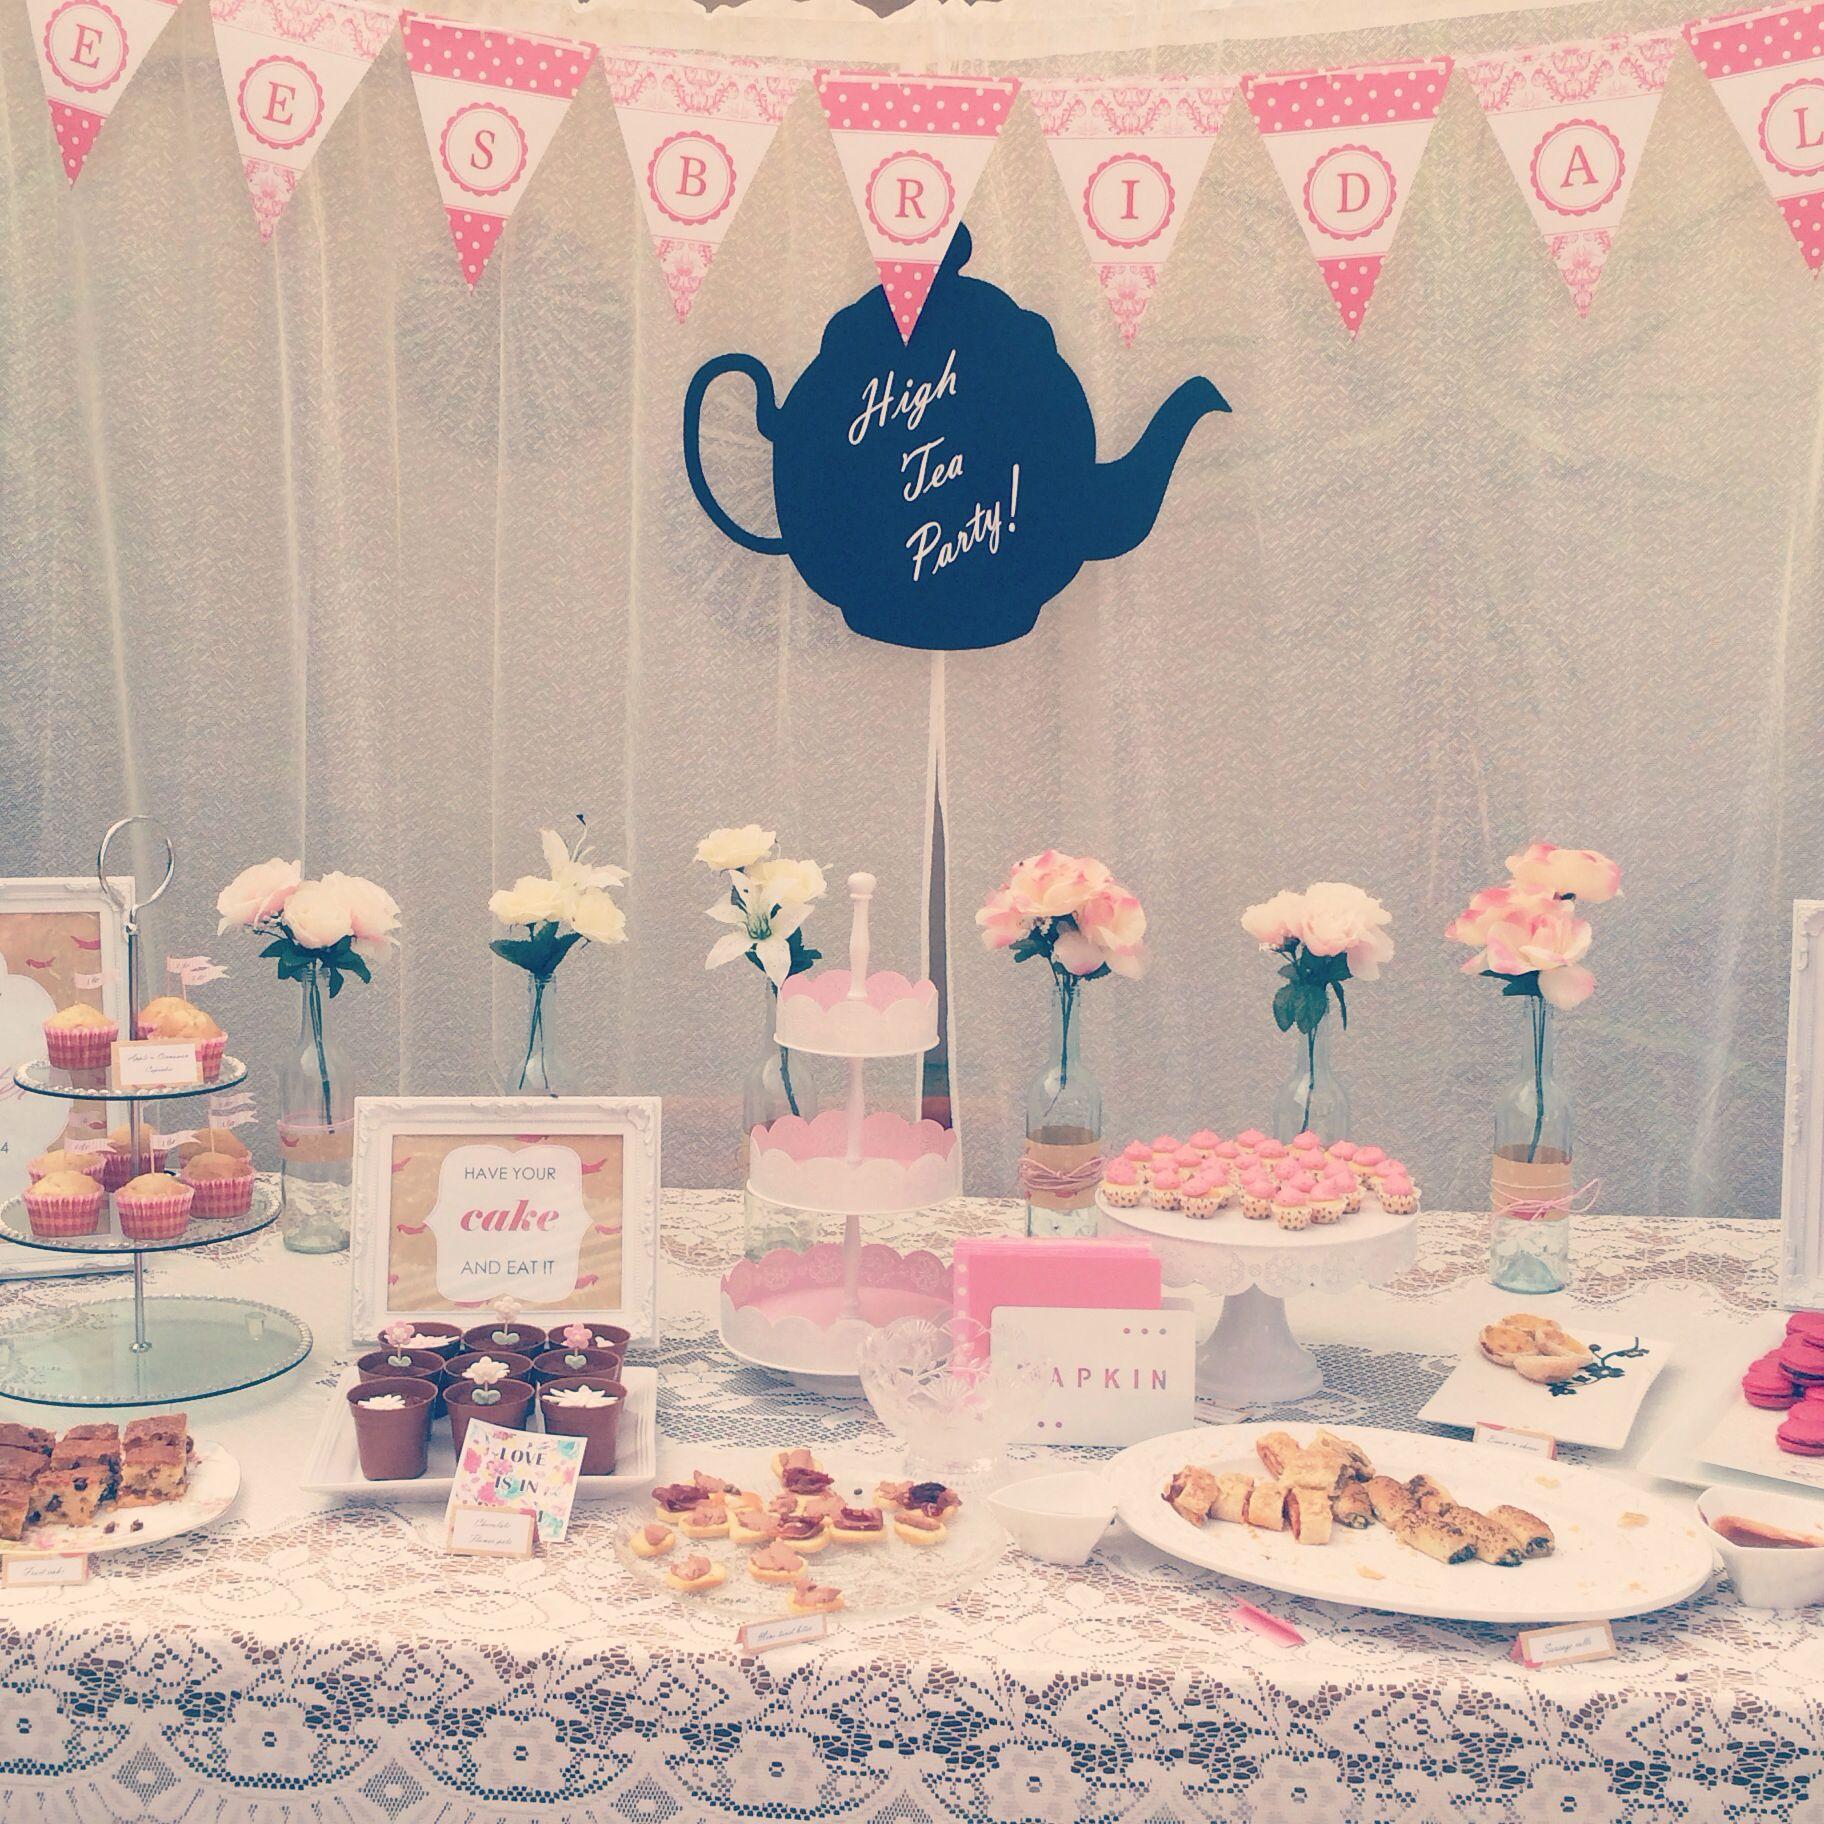 Wedding High Table Decoration Ideas: Bridal Shower, Food Table, Decorations, DIY, High Tea